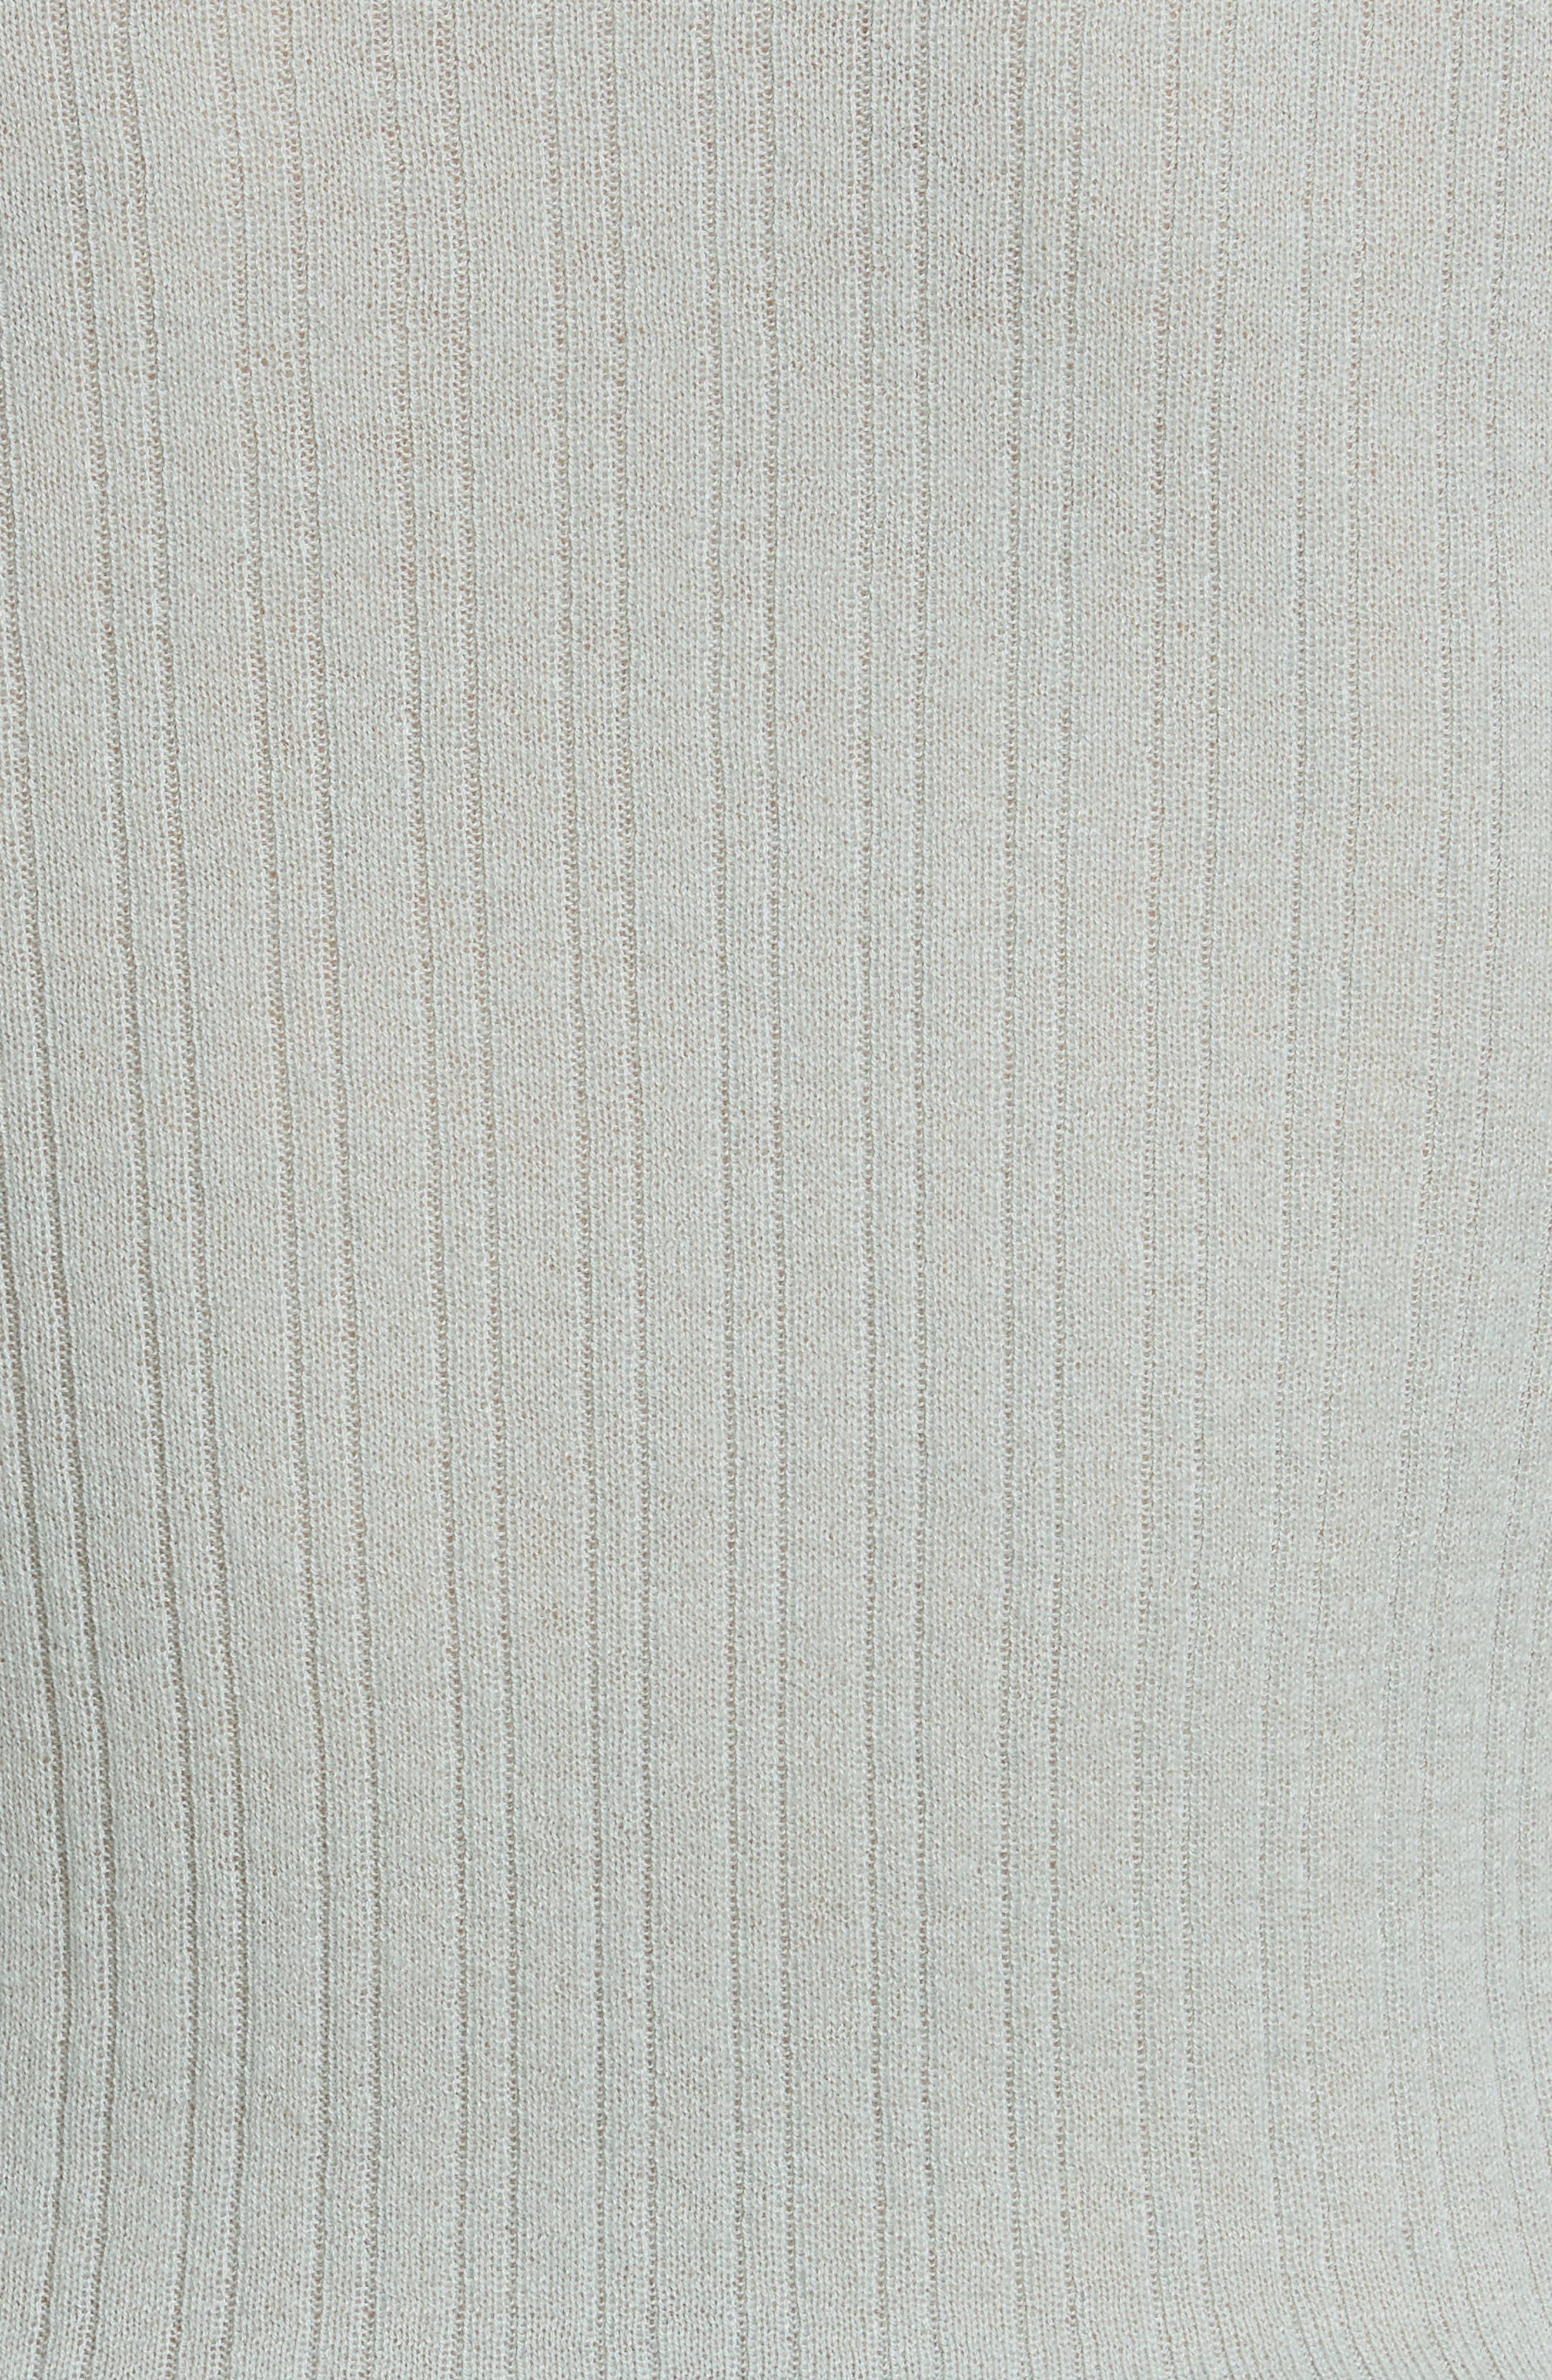 Ribbed Cashmere V-Neck Sweater,                             Alternate thumbnail 15, color,